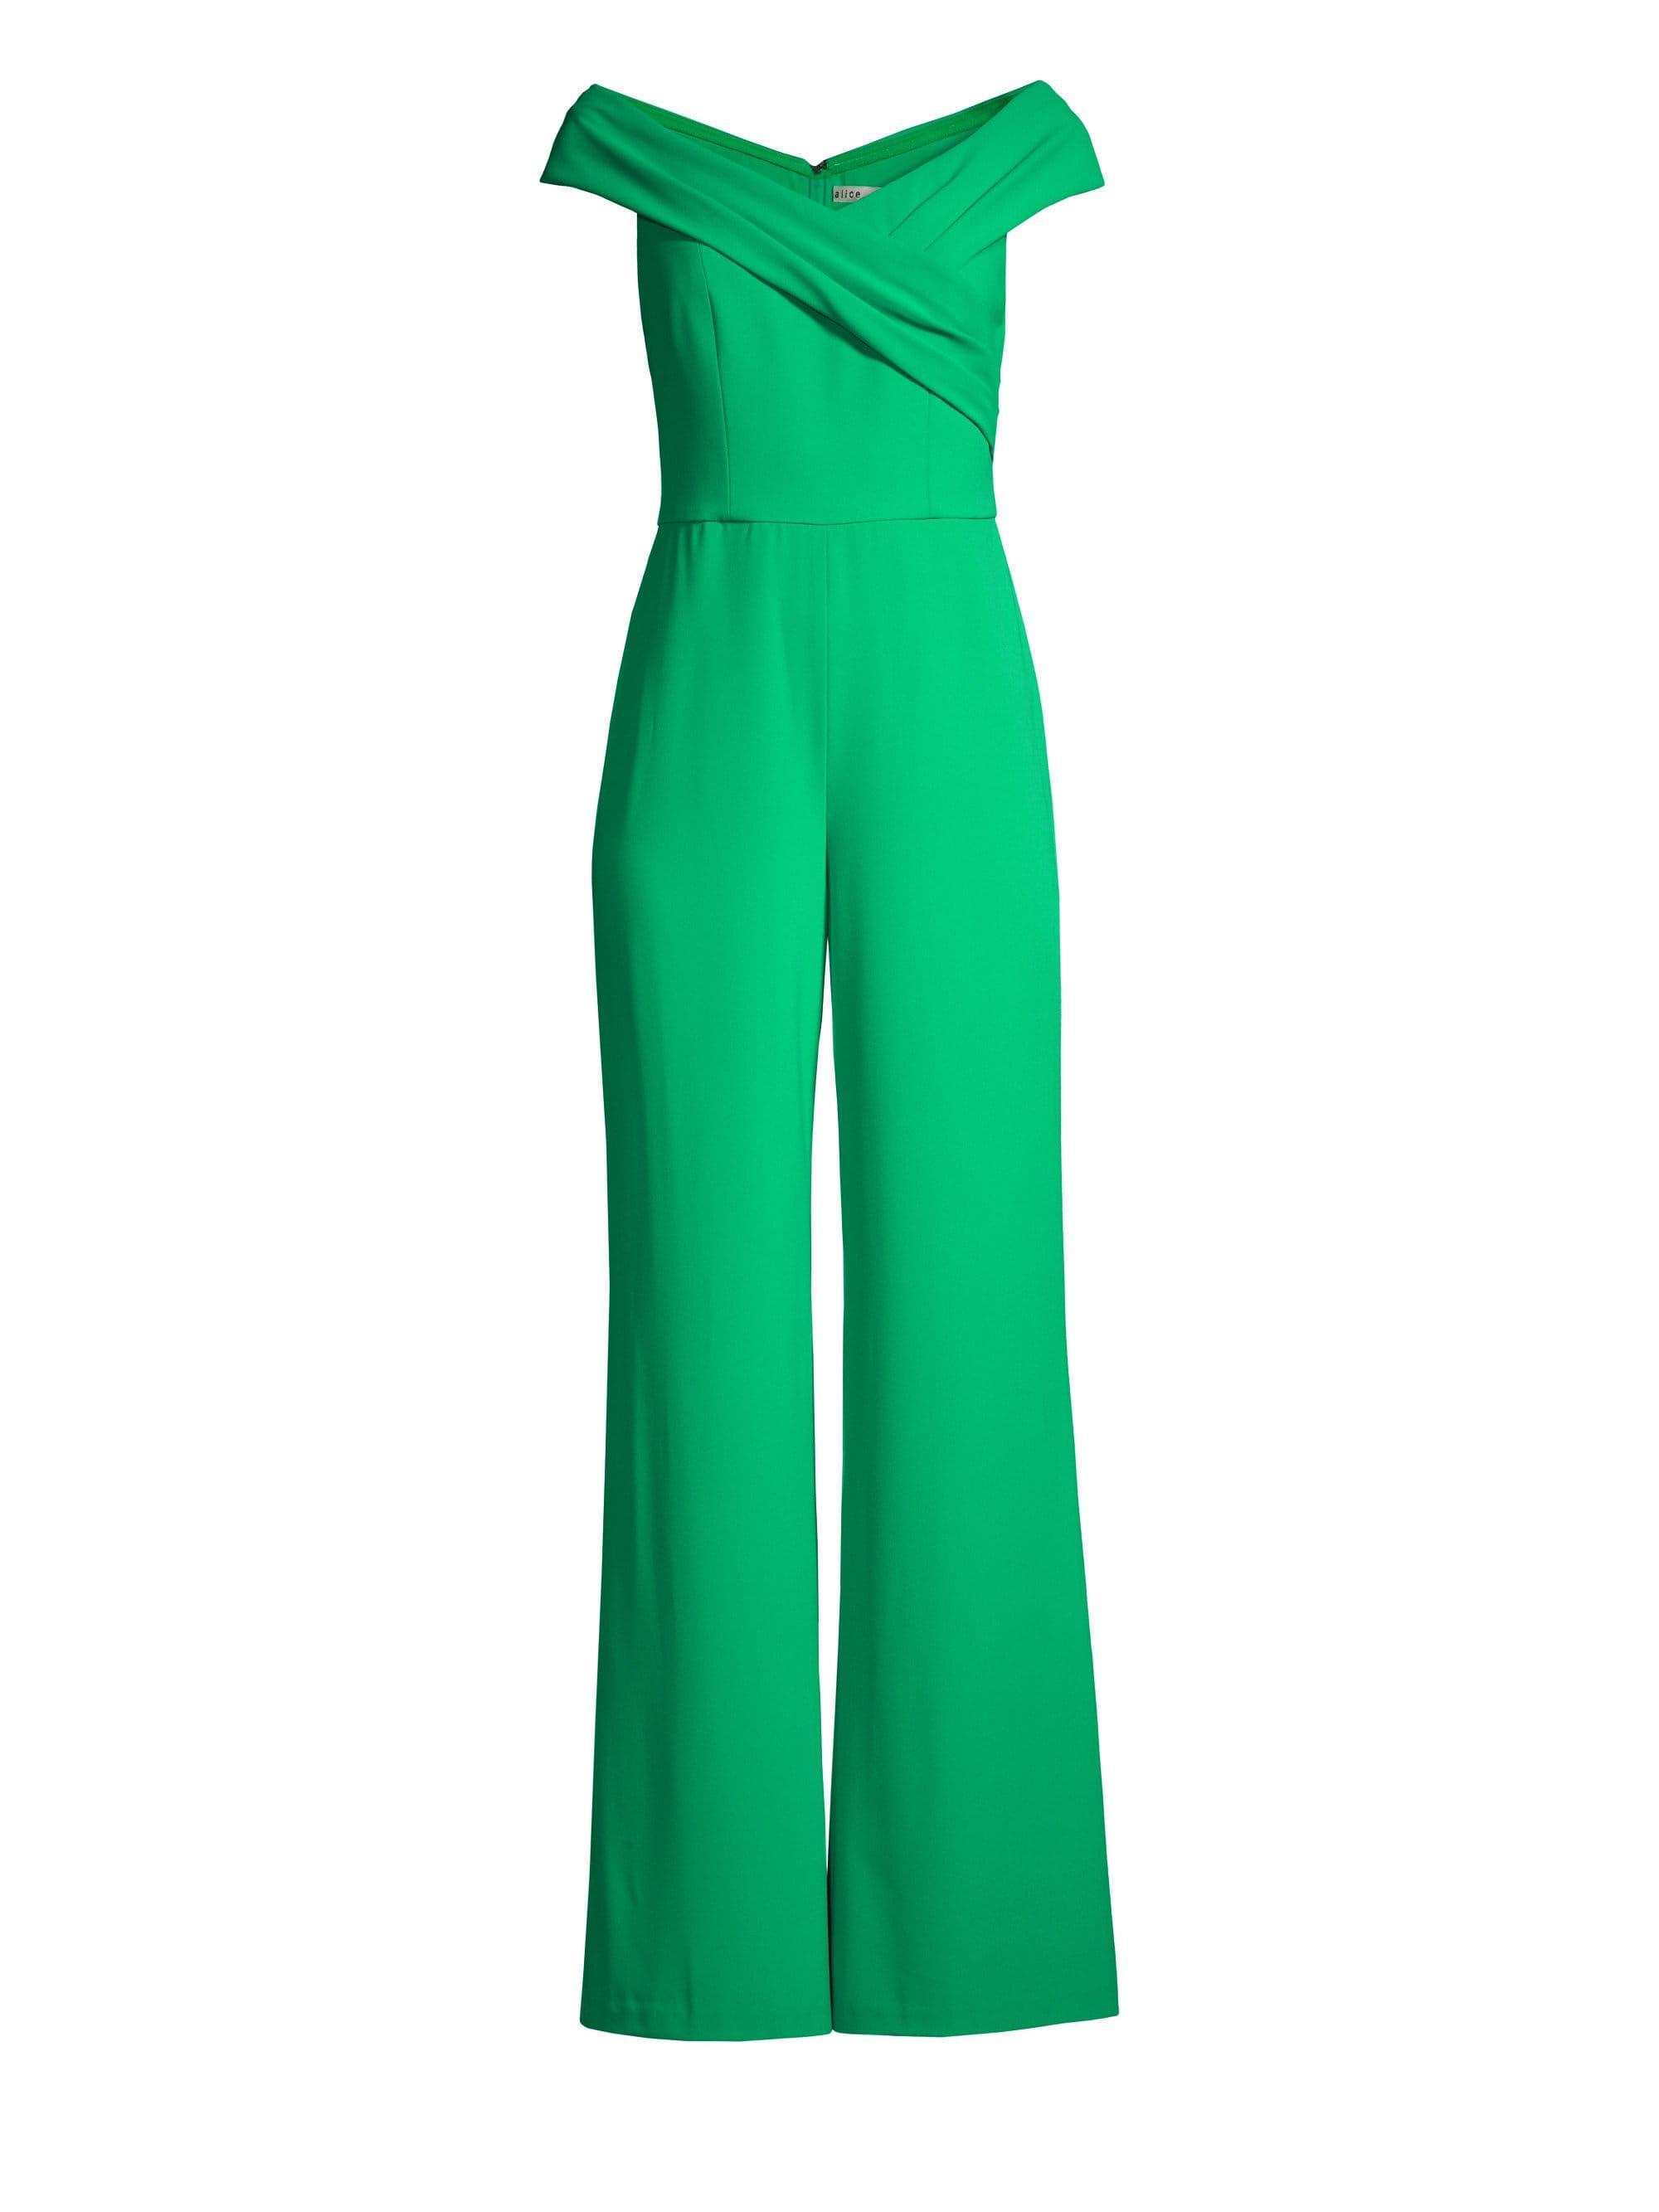 b71c4506b44 Lyst - Alice + Olivia Kaye Wrap Shoulder Jumpsuit in Green